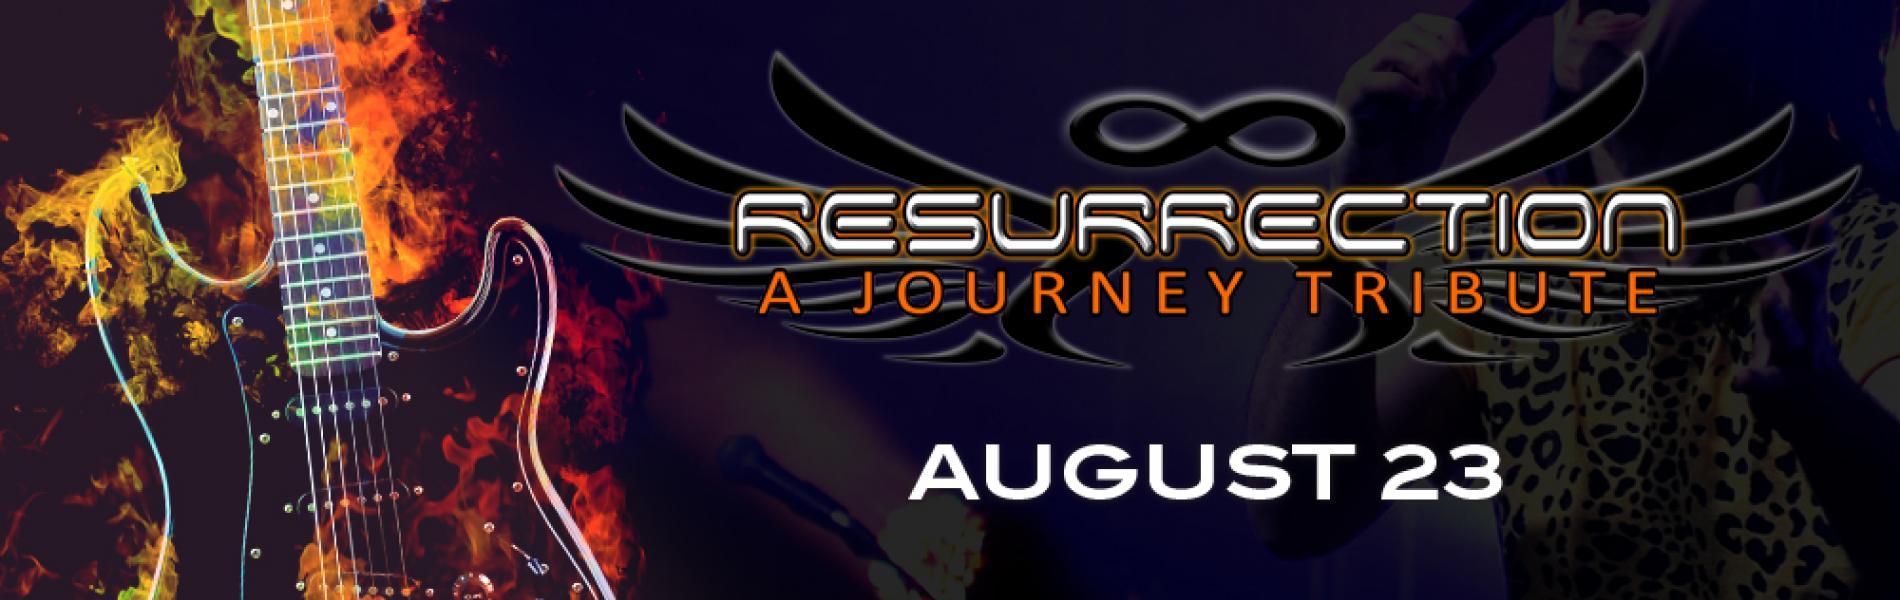 Resurrection: A Journey Tribute